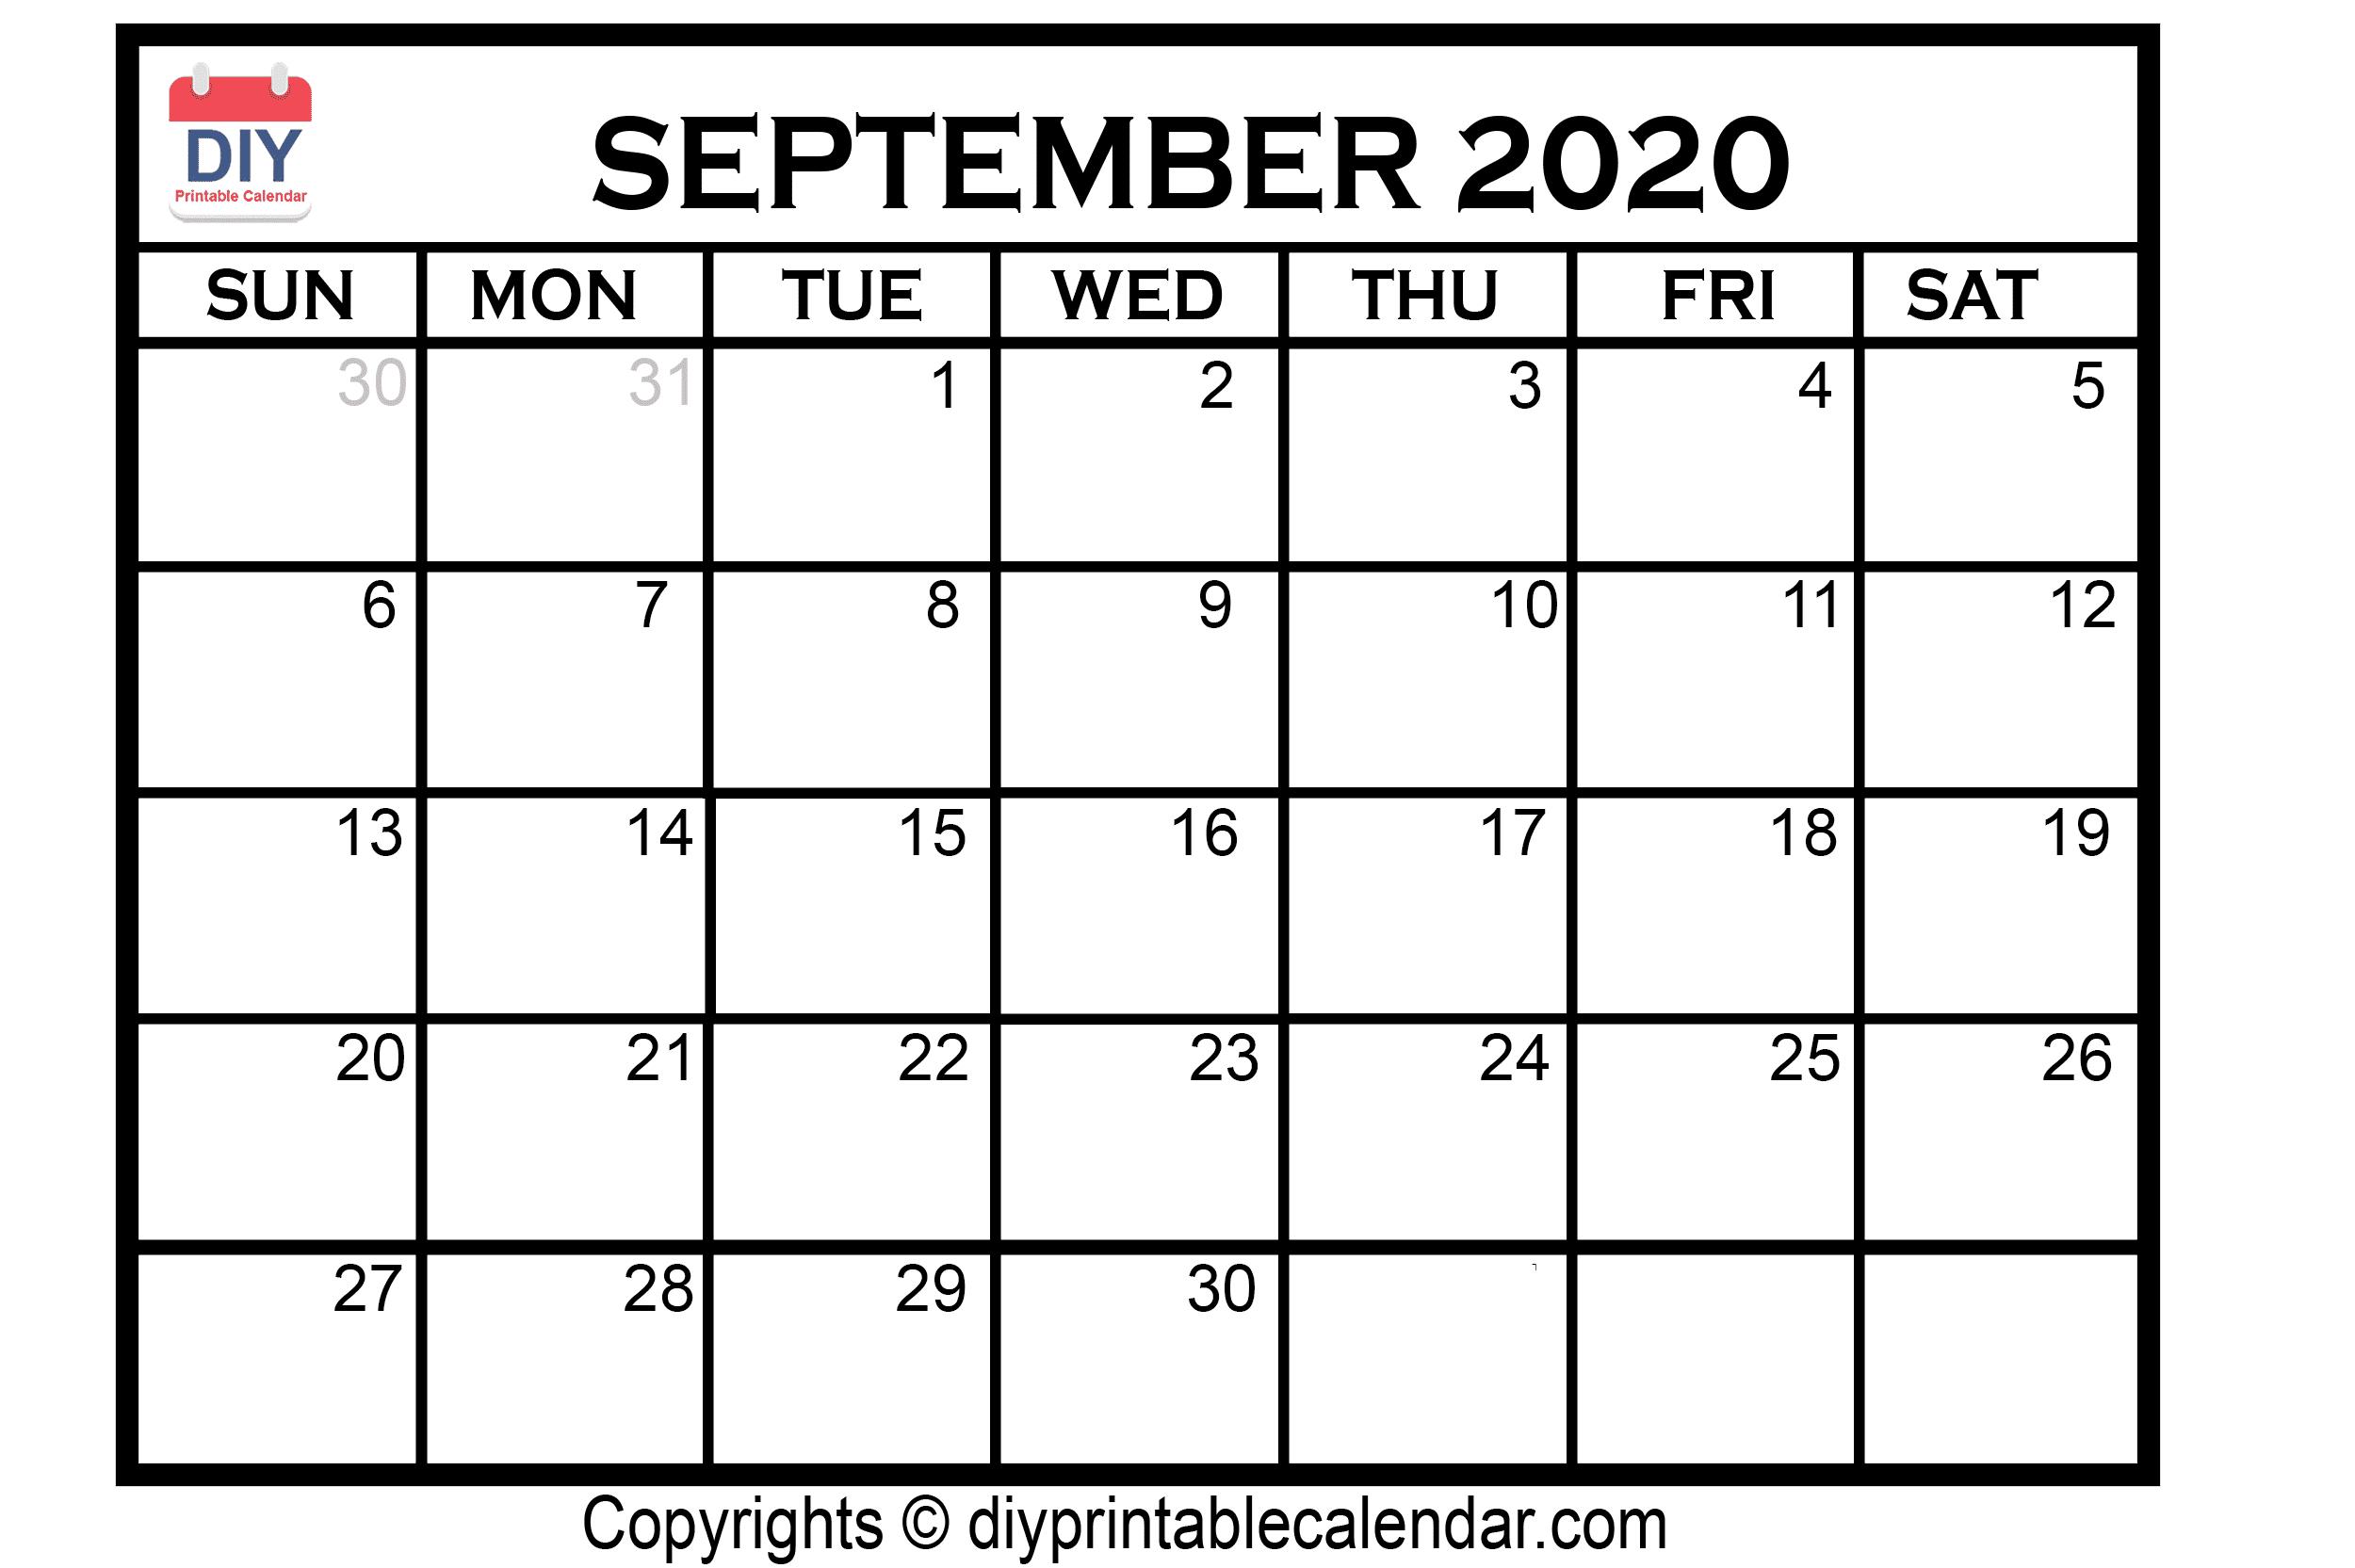 September 2020 Printable Calendar Template